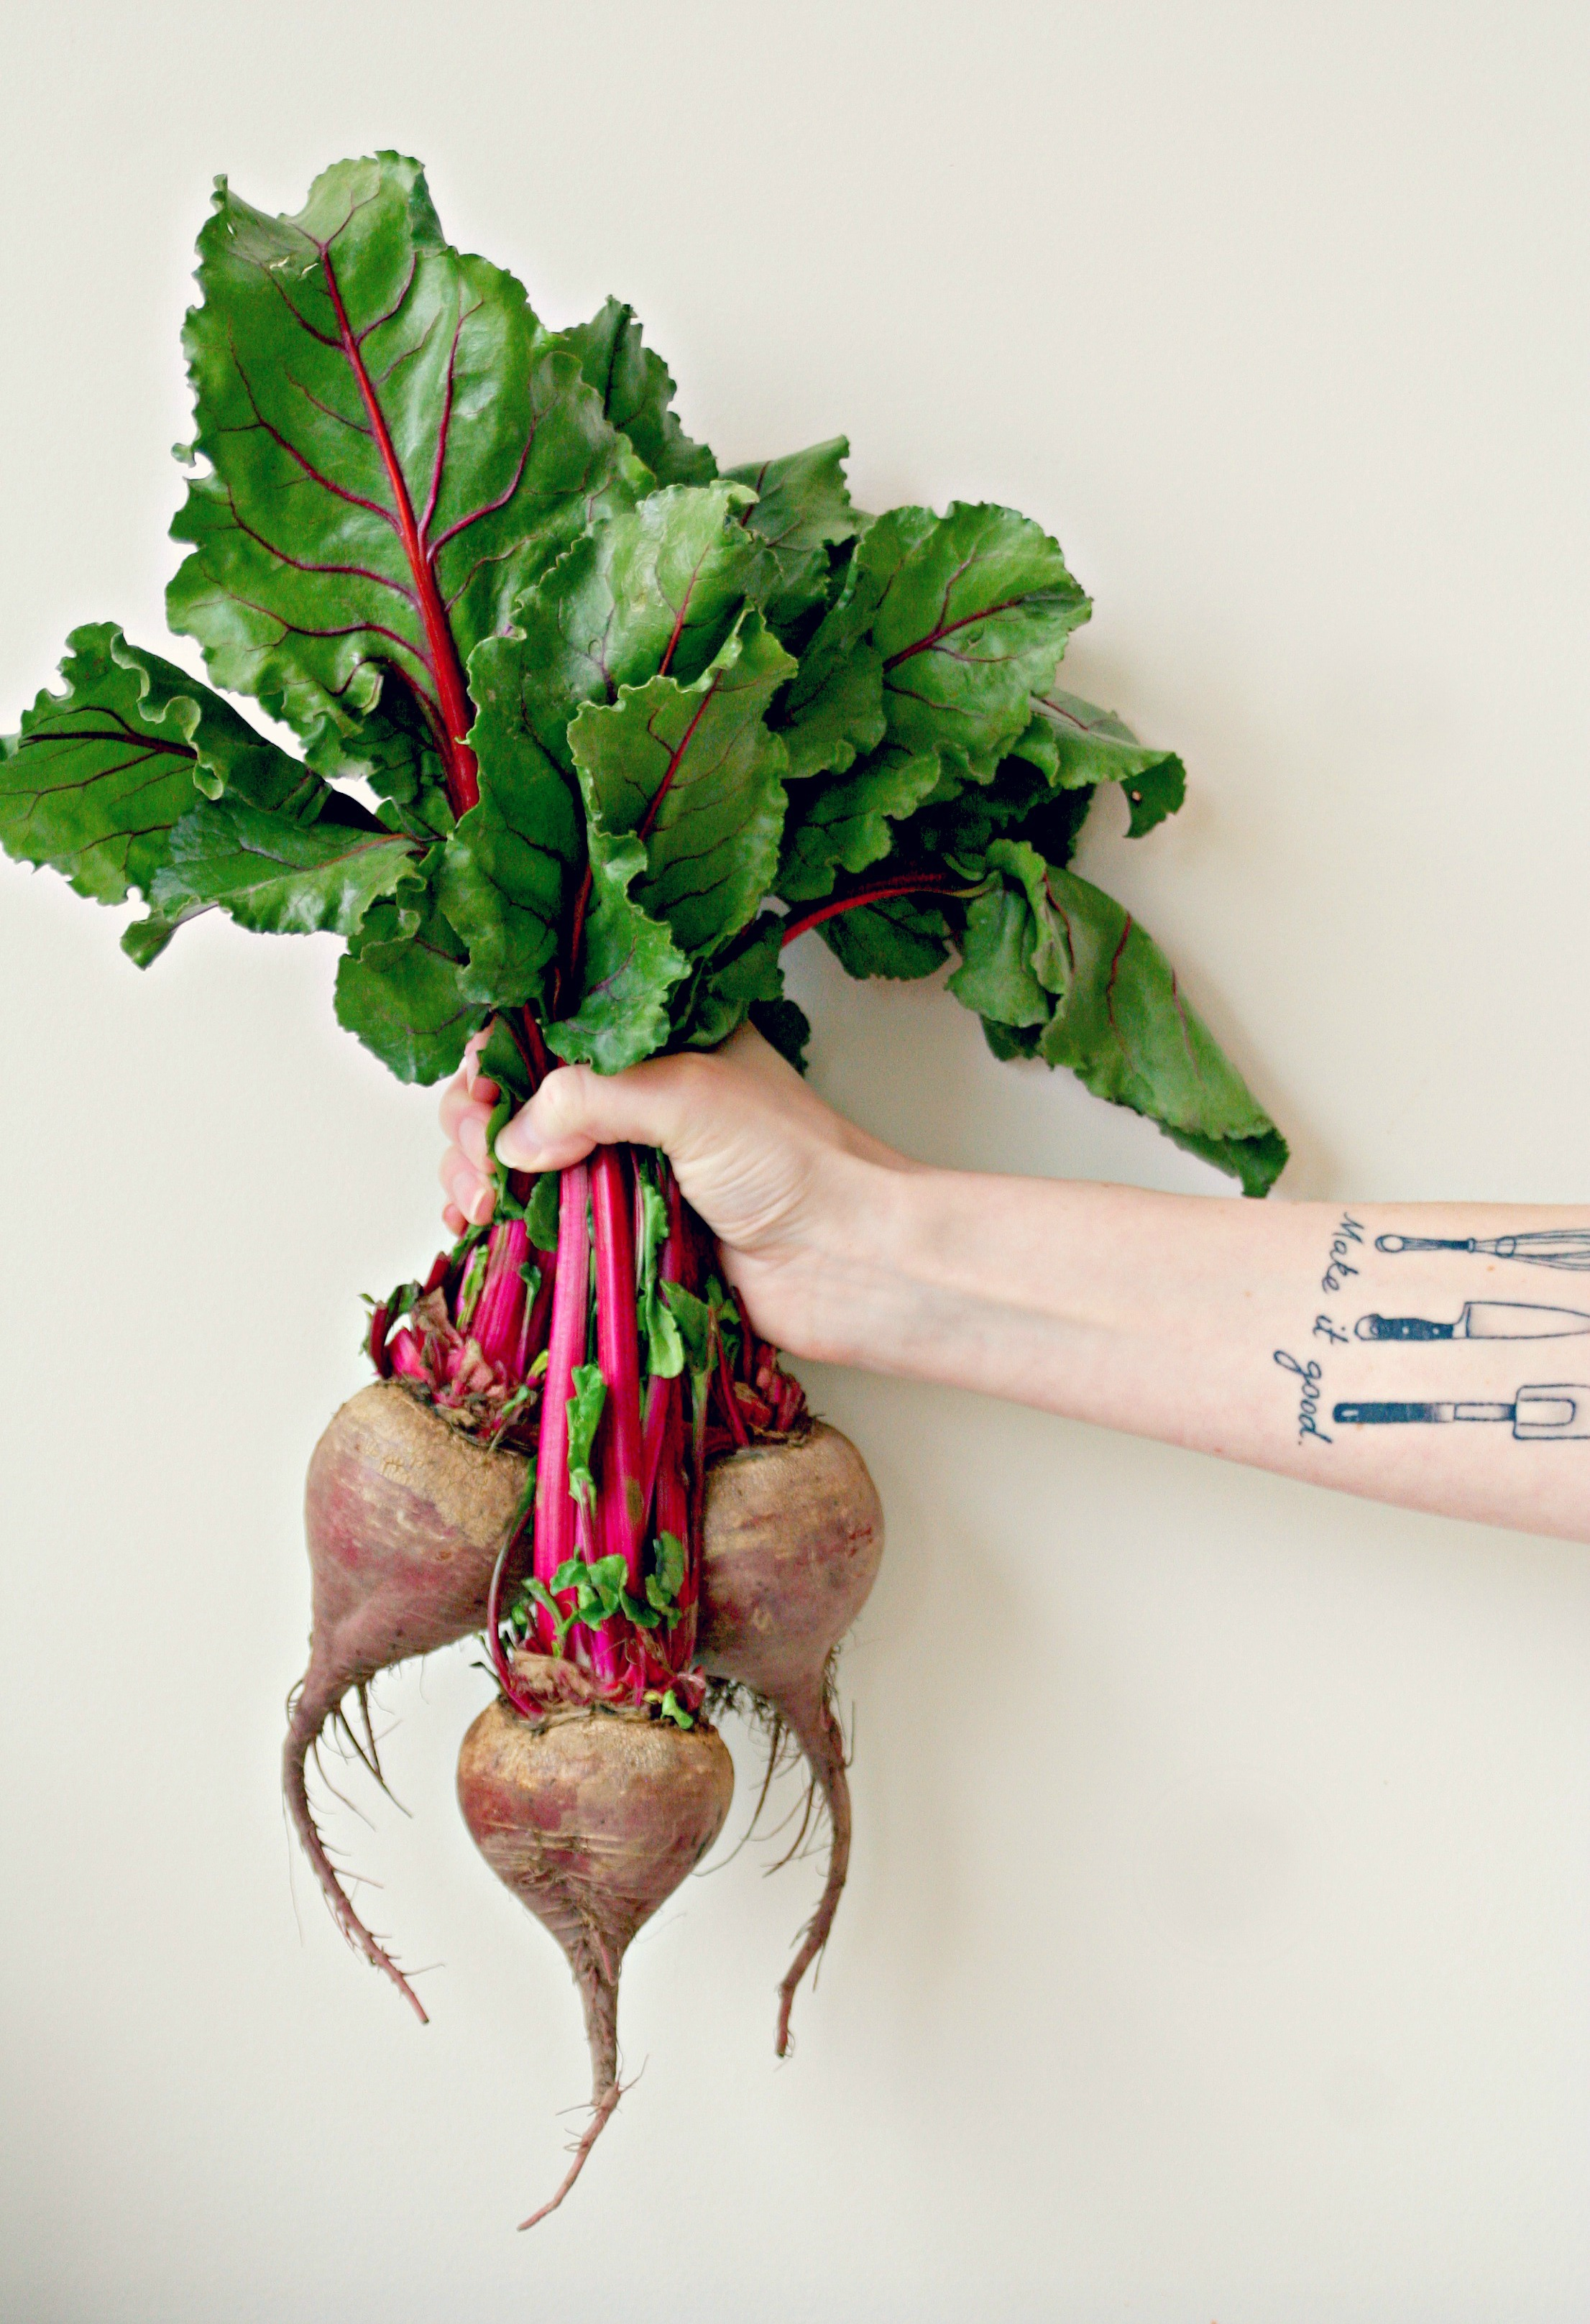 Just beet it. 3